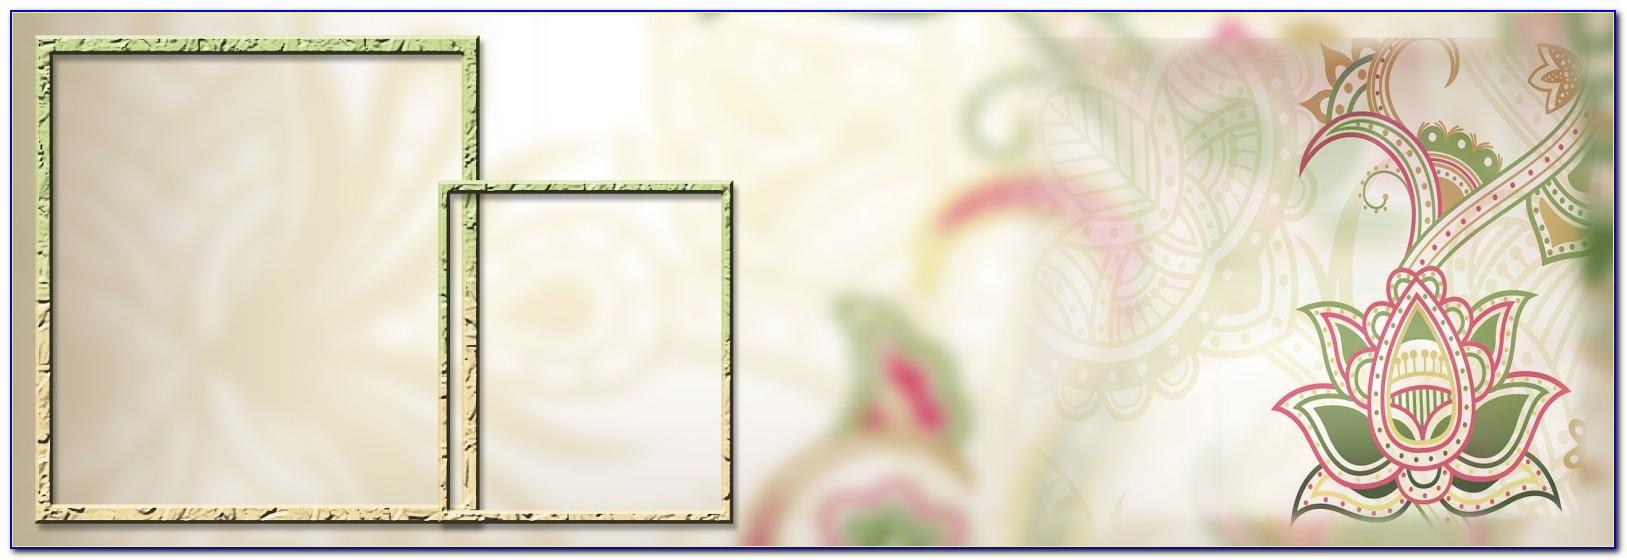 Indian Wedding Album Design Templates Psd Free Download